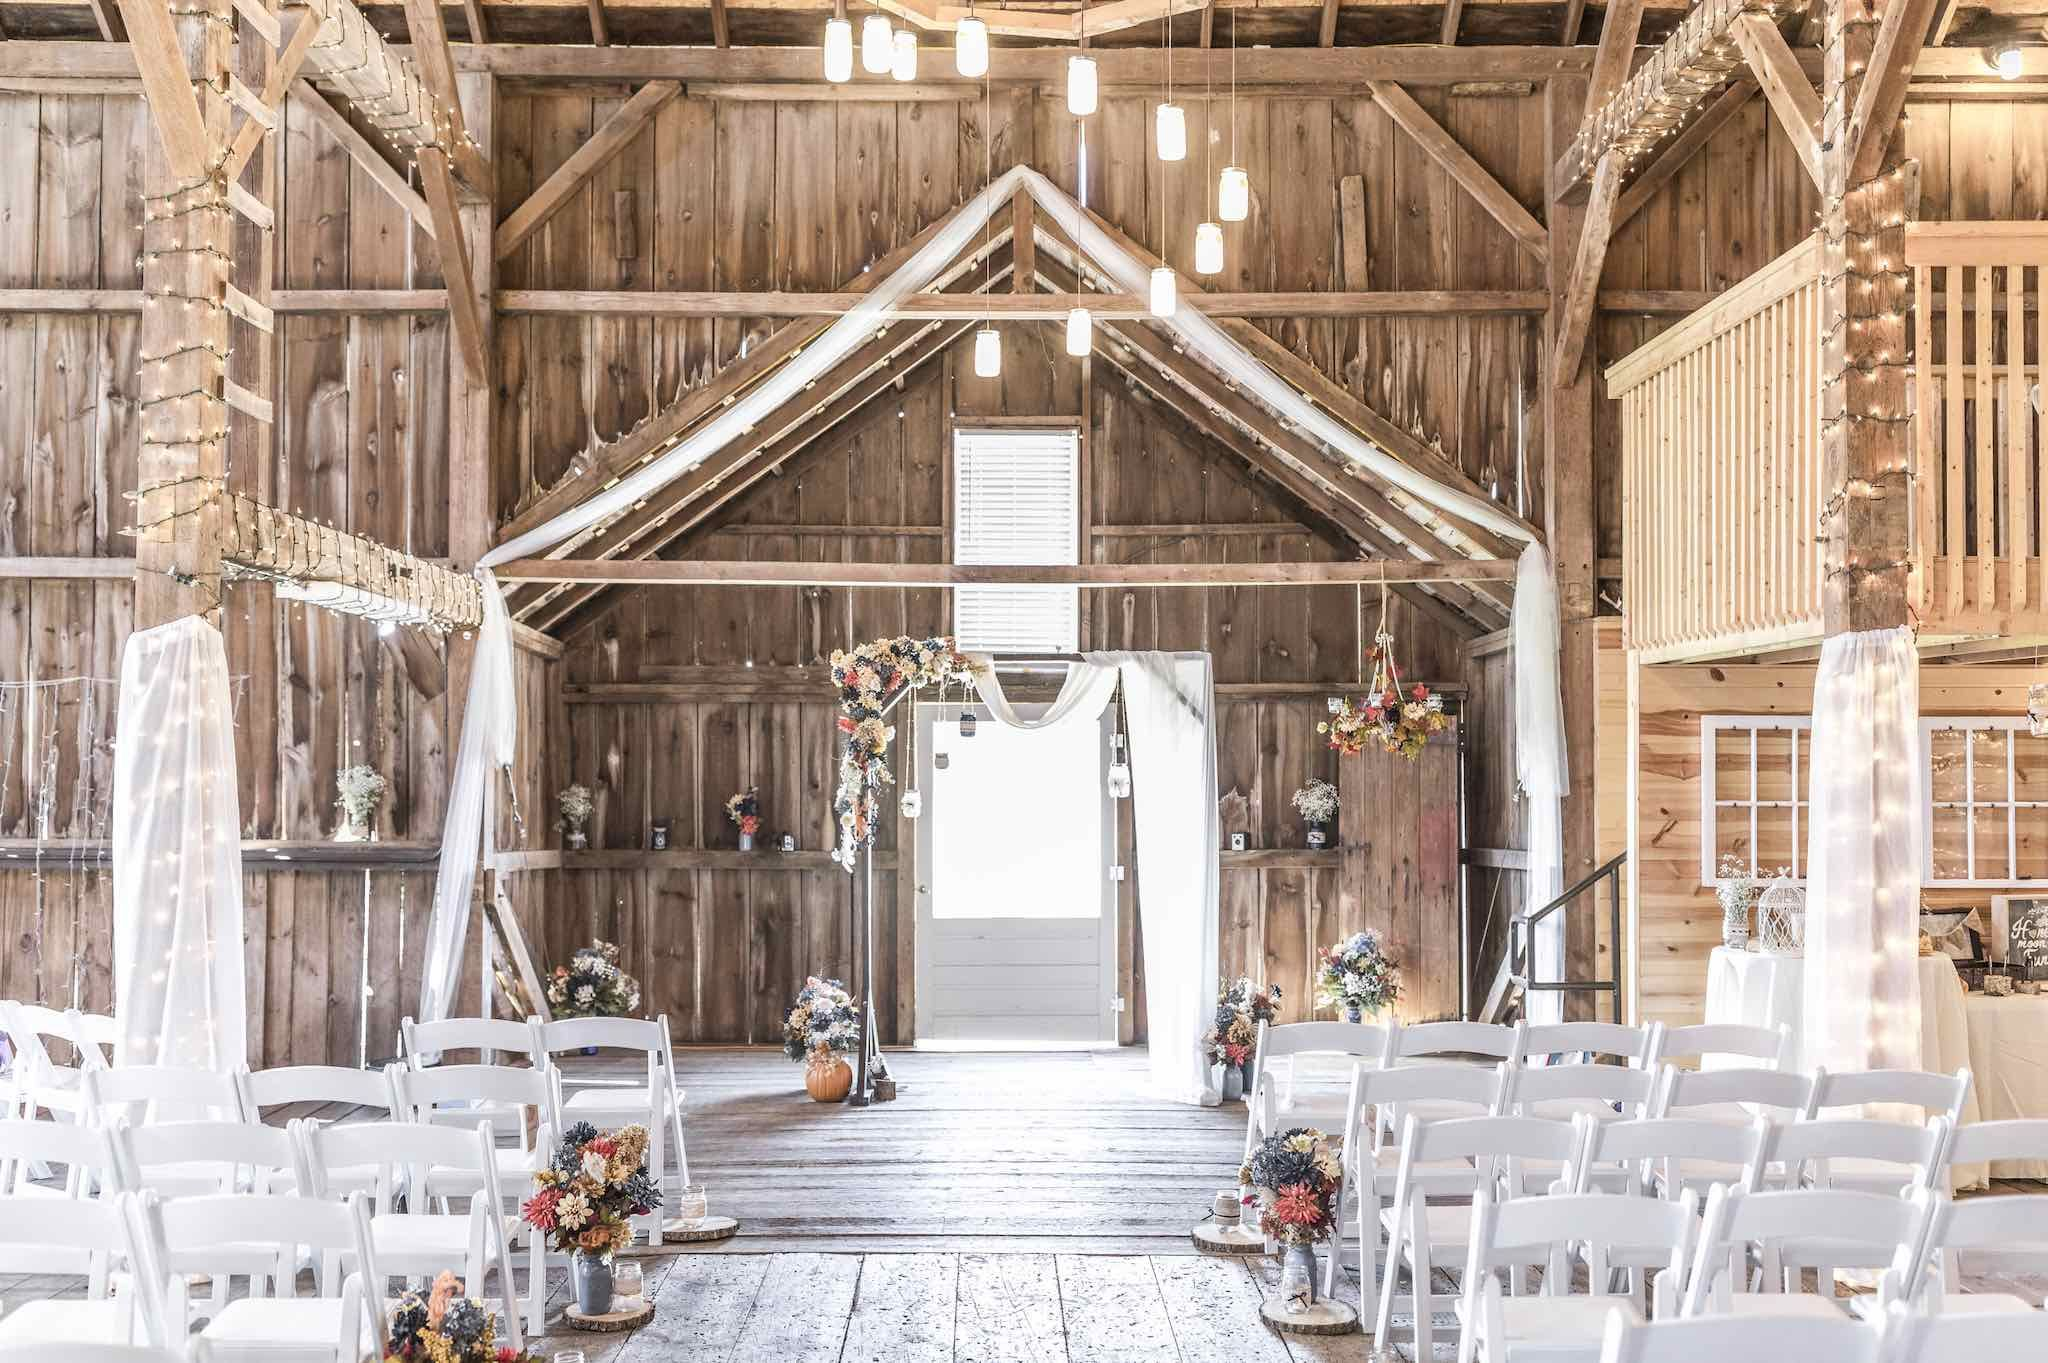 The Brauer Barn - Winnebago, IL | Rustic wedding venues ...